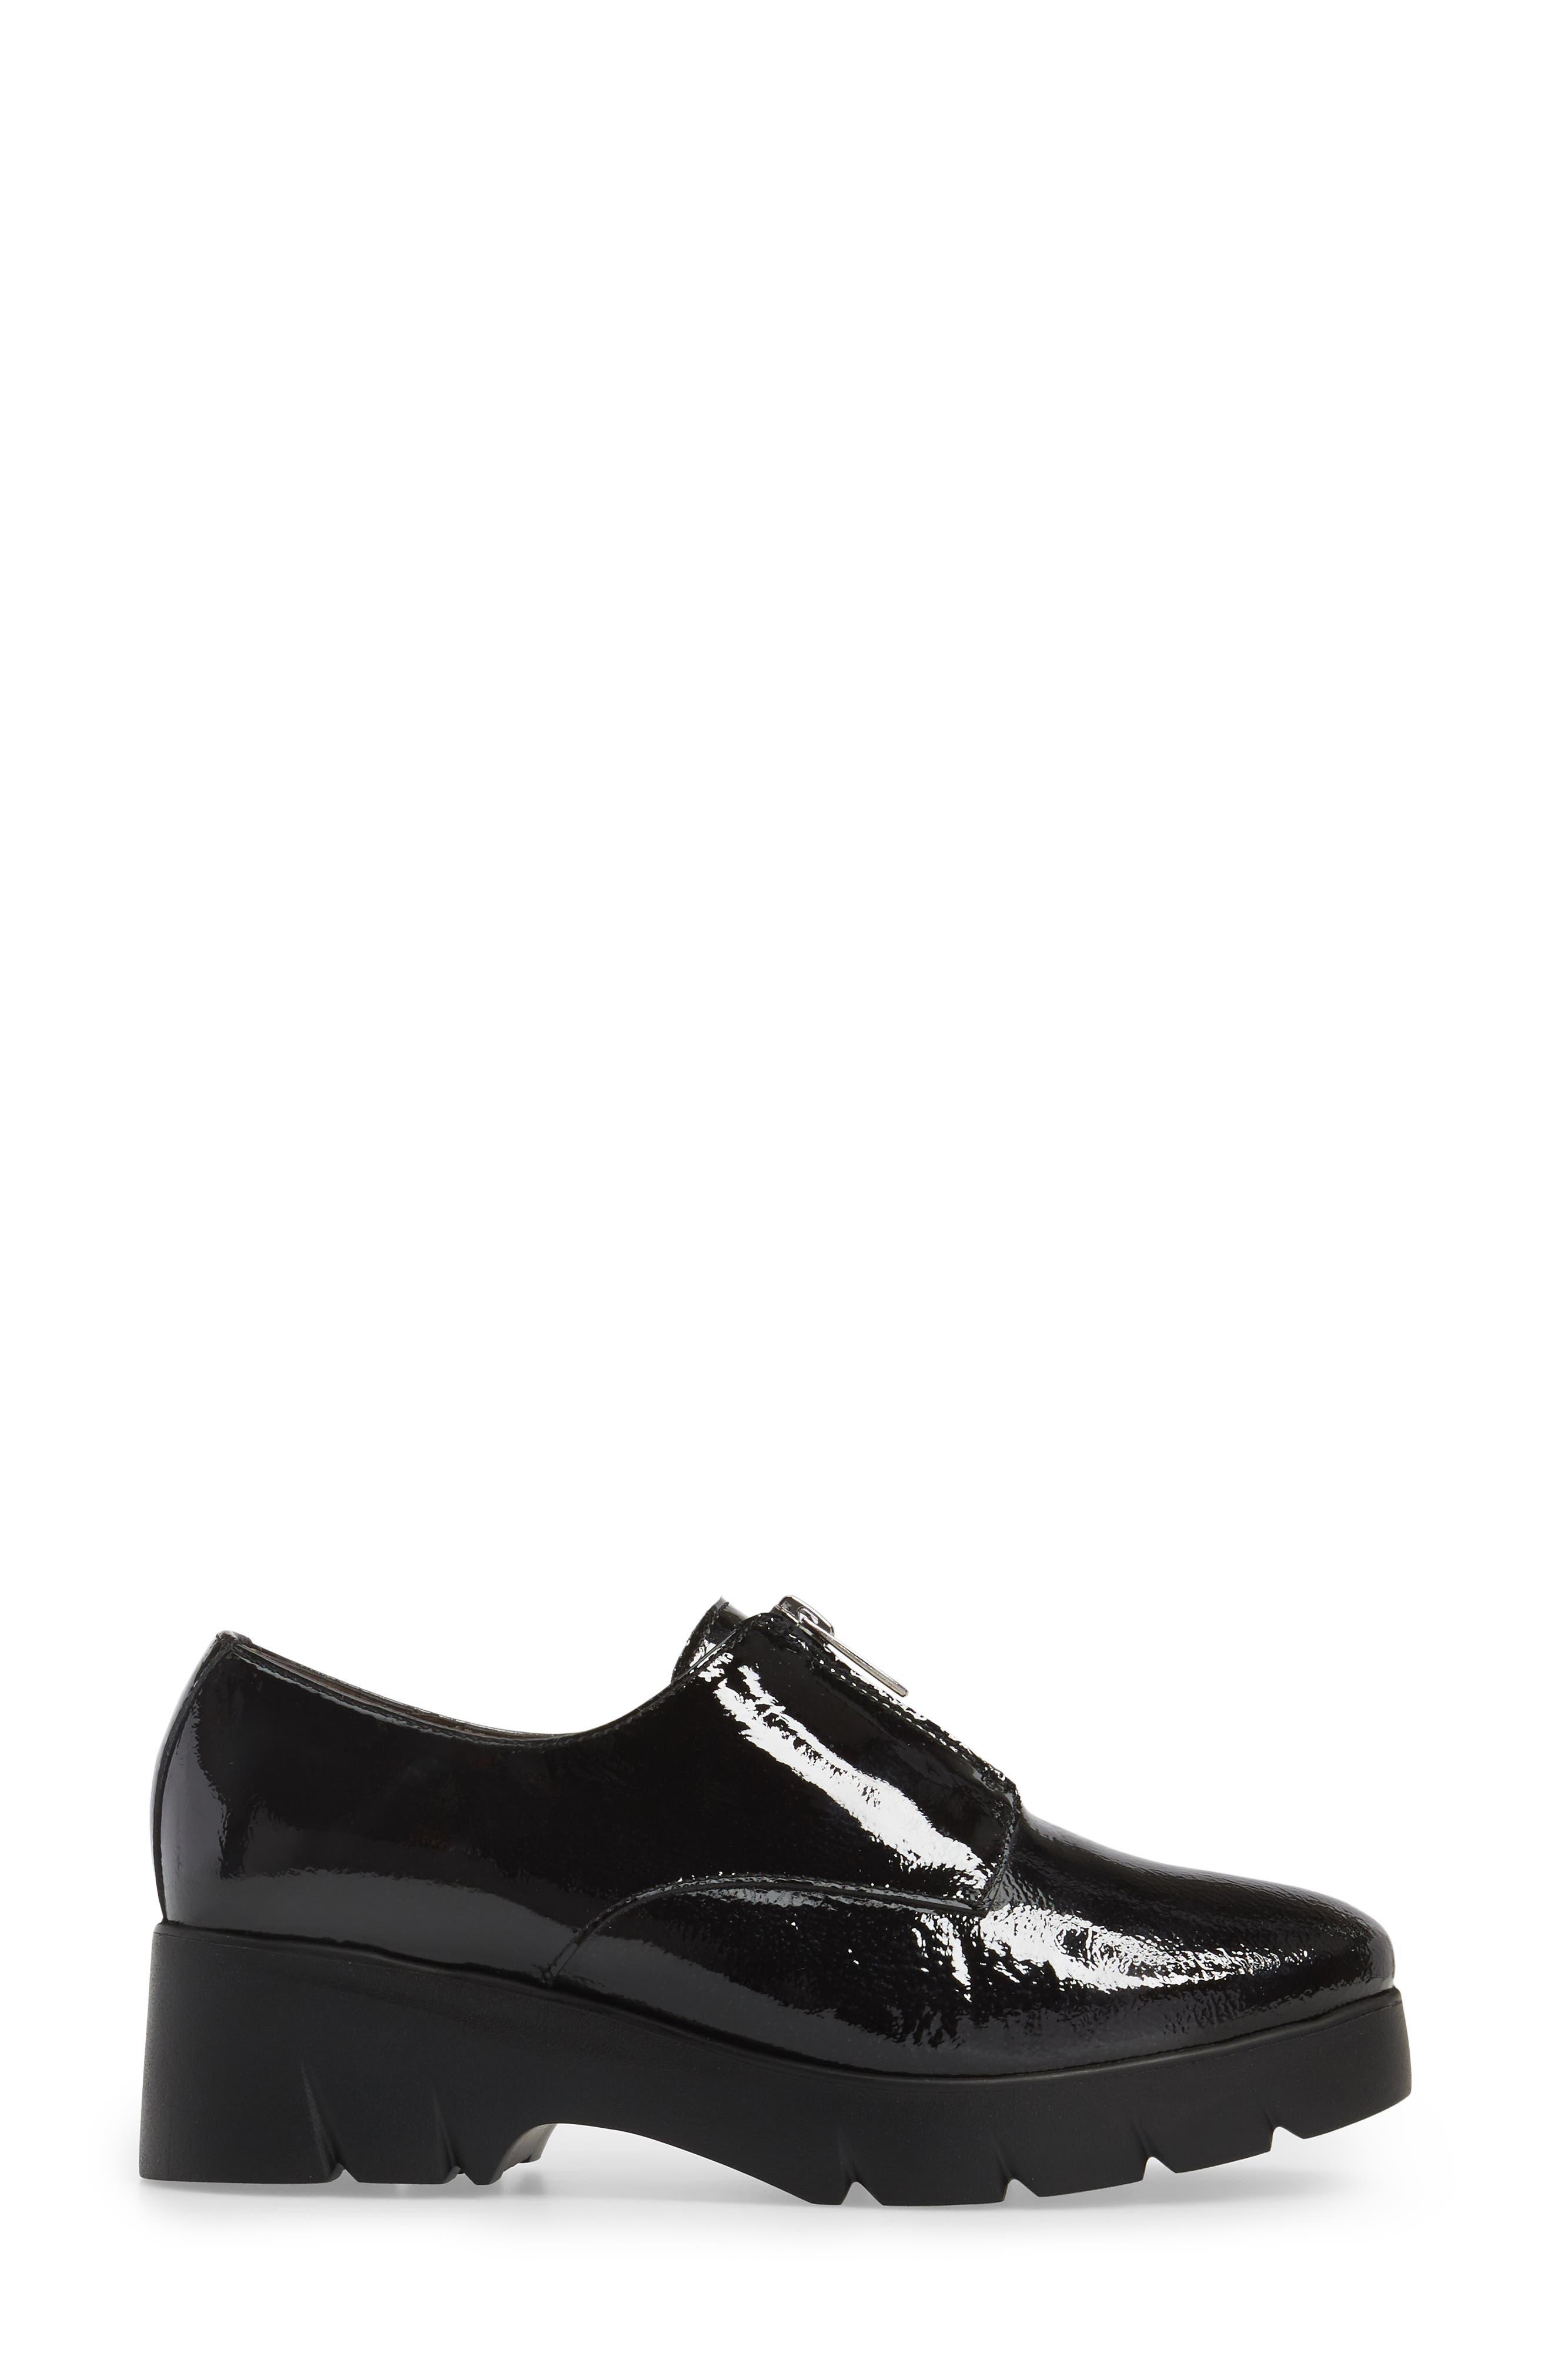 Platform Derby,                             Alternate thumbnail 3, color,                             Black Patent Leather